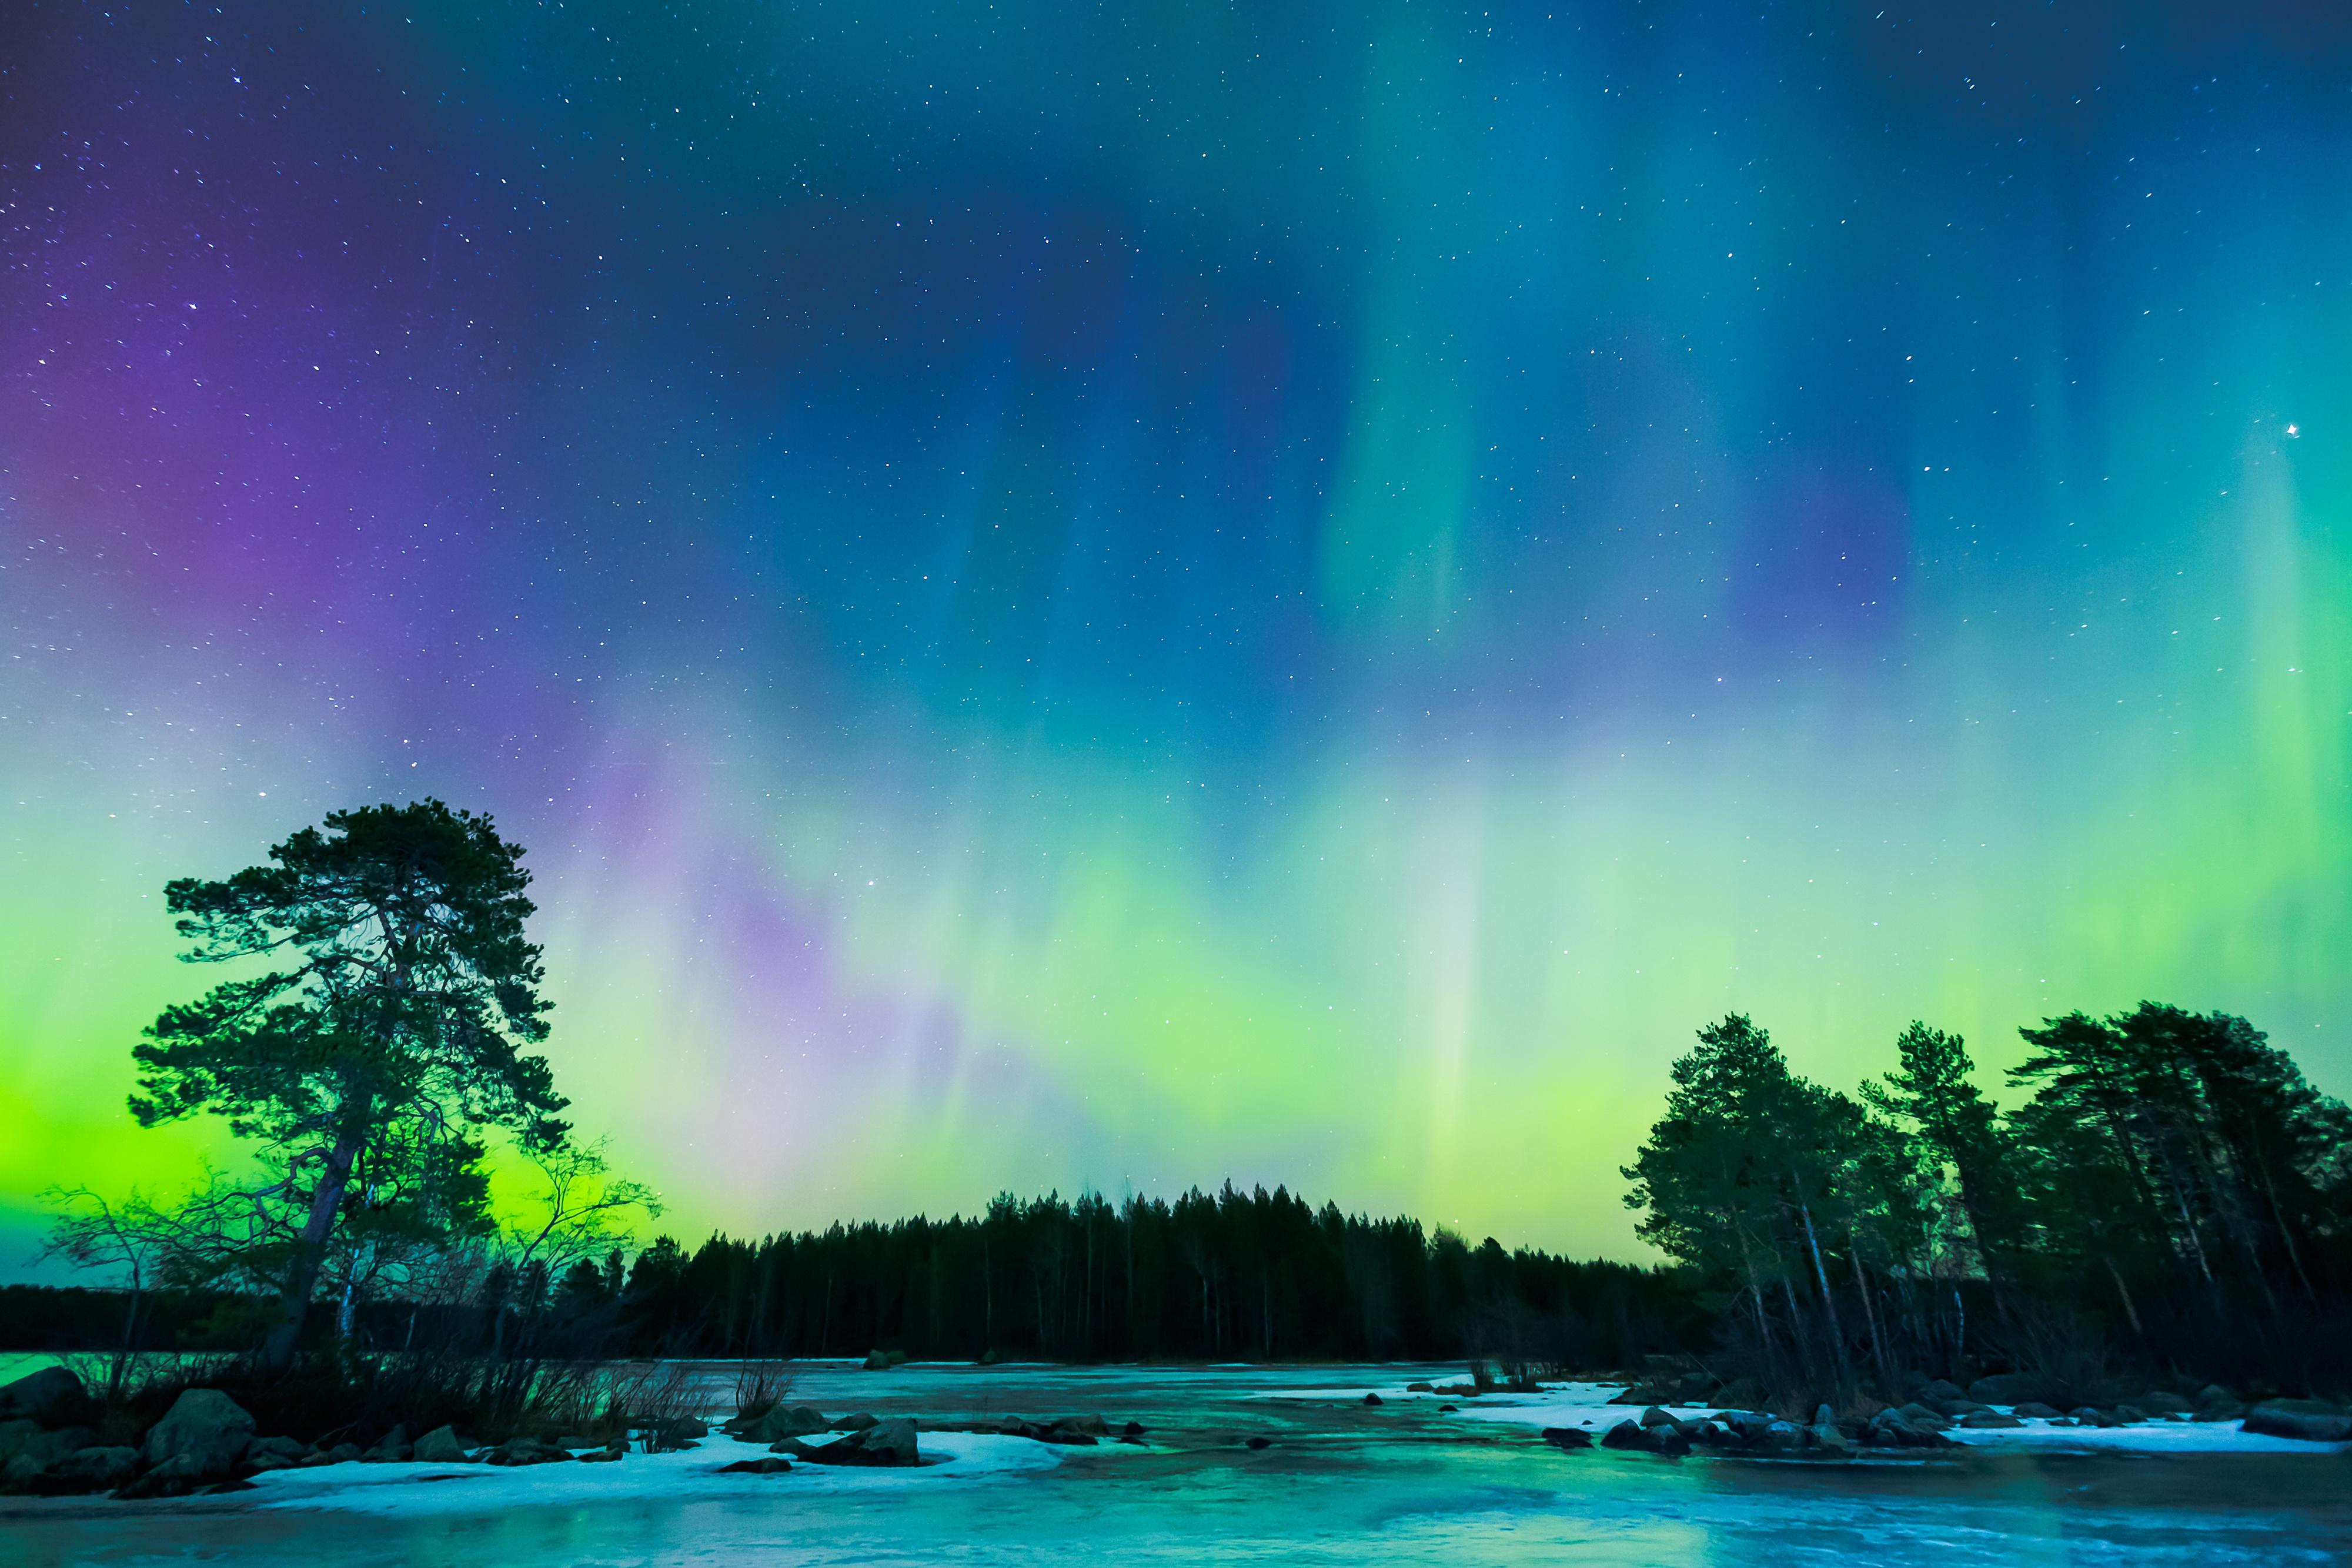 Aurora Borealis 4k Ultra HD Wallpaper   Background Image ...